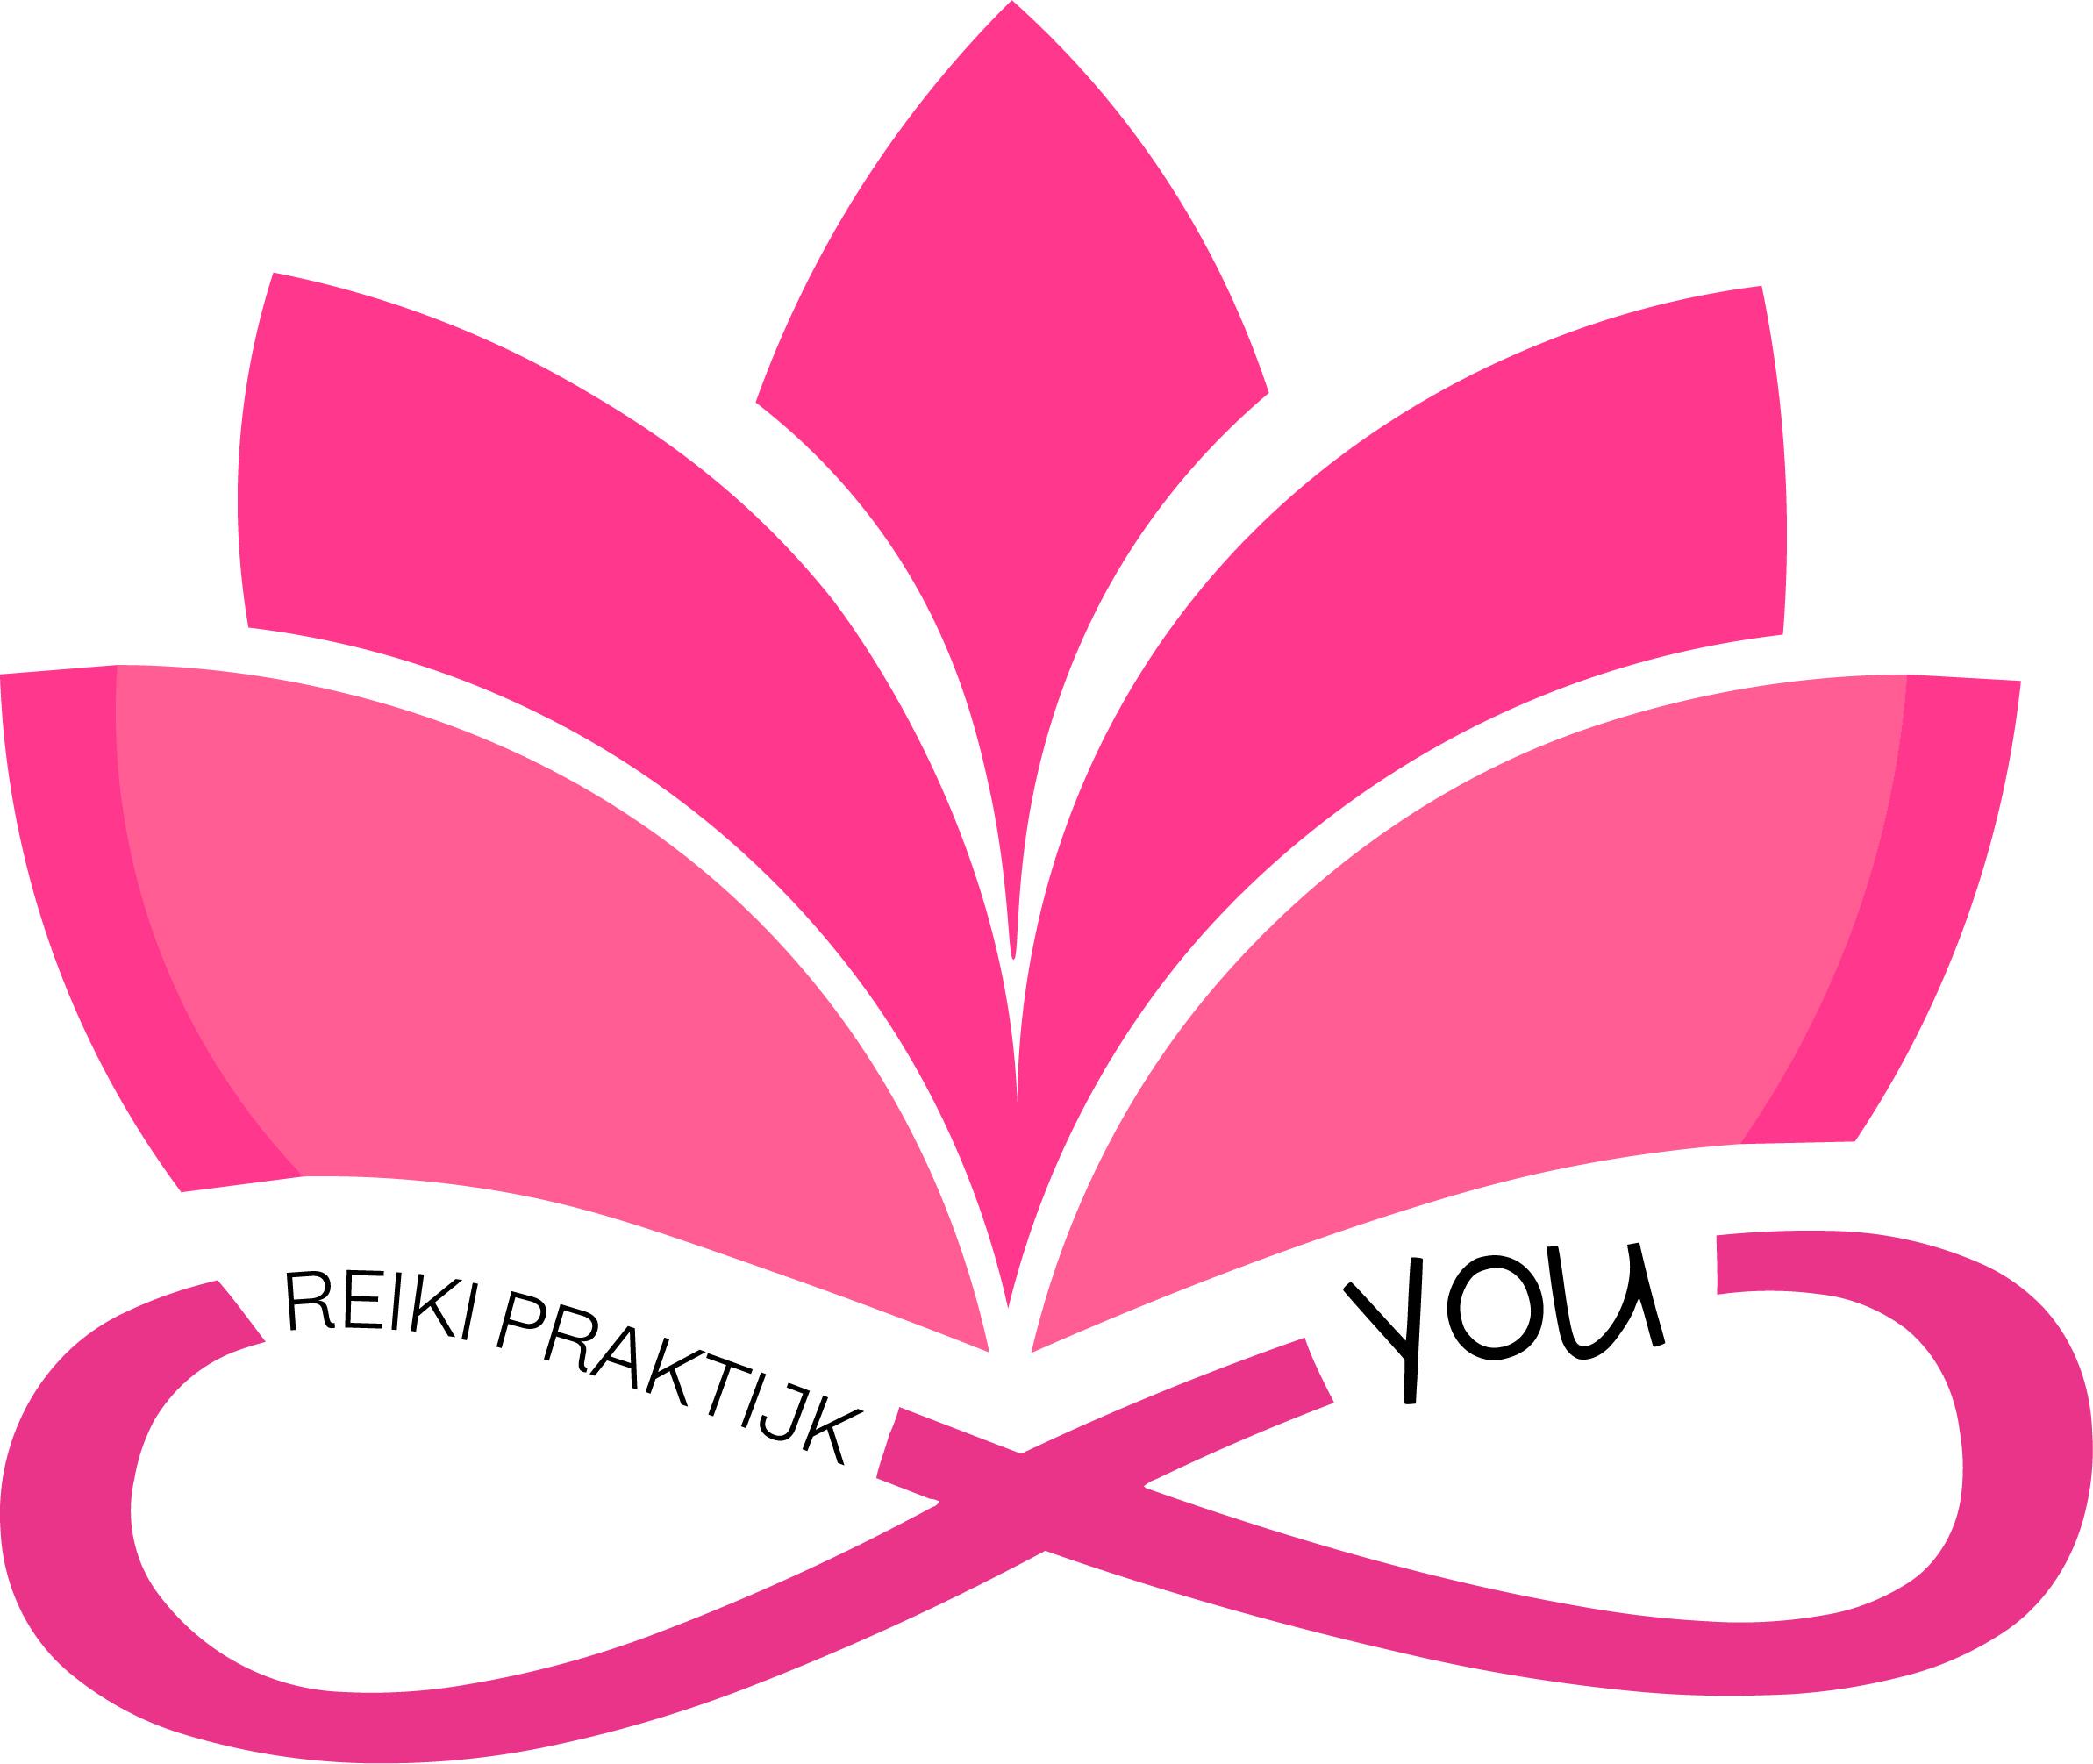 Reiki praktijk YOU